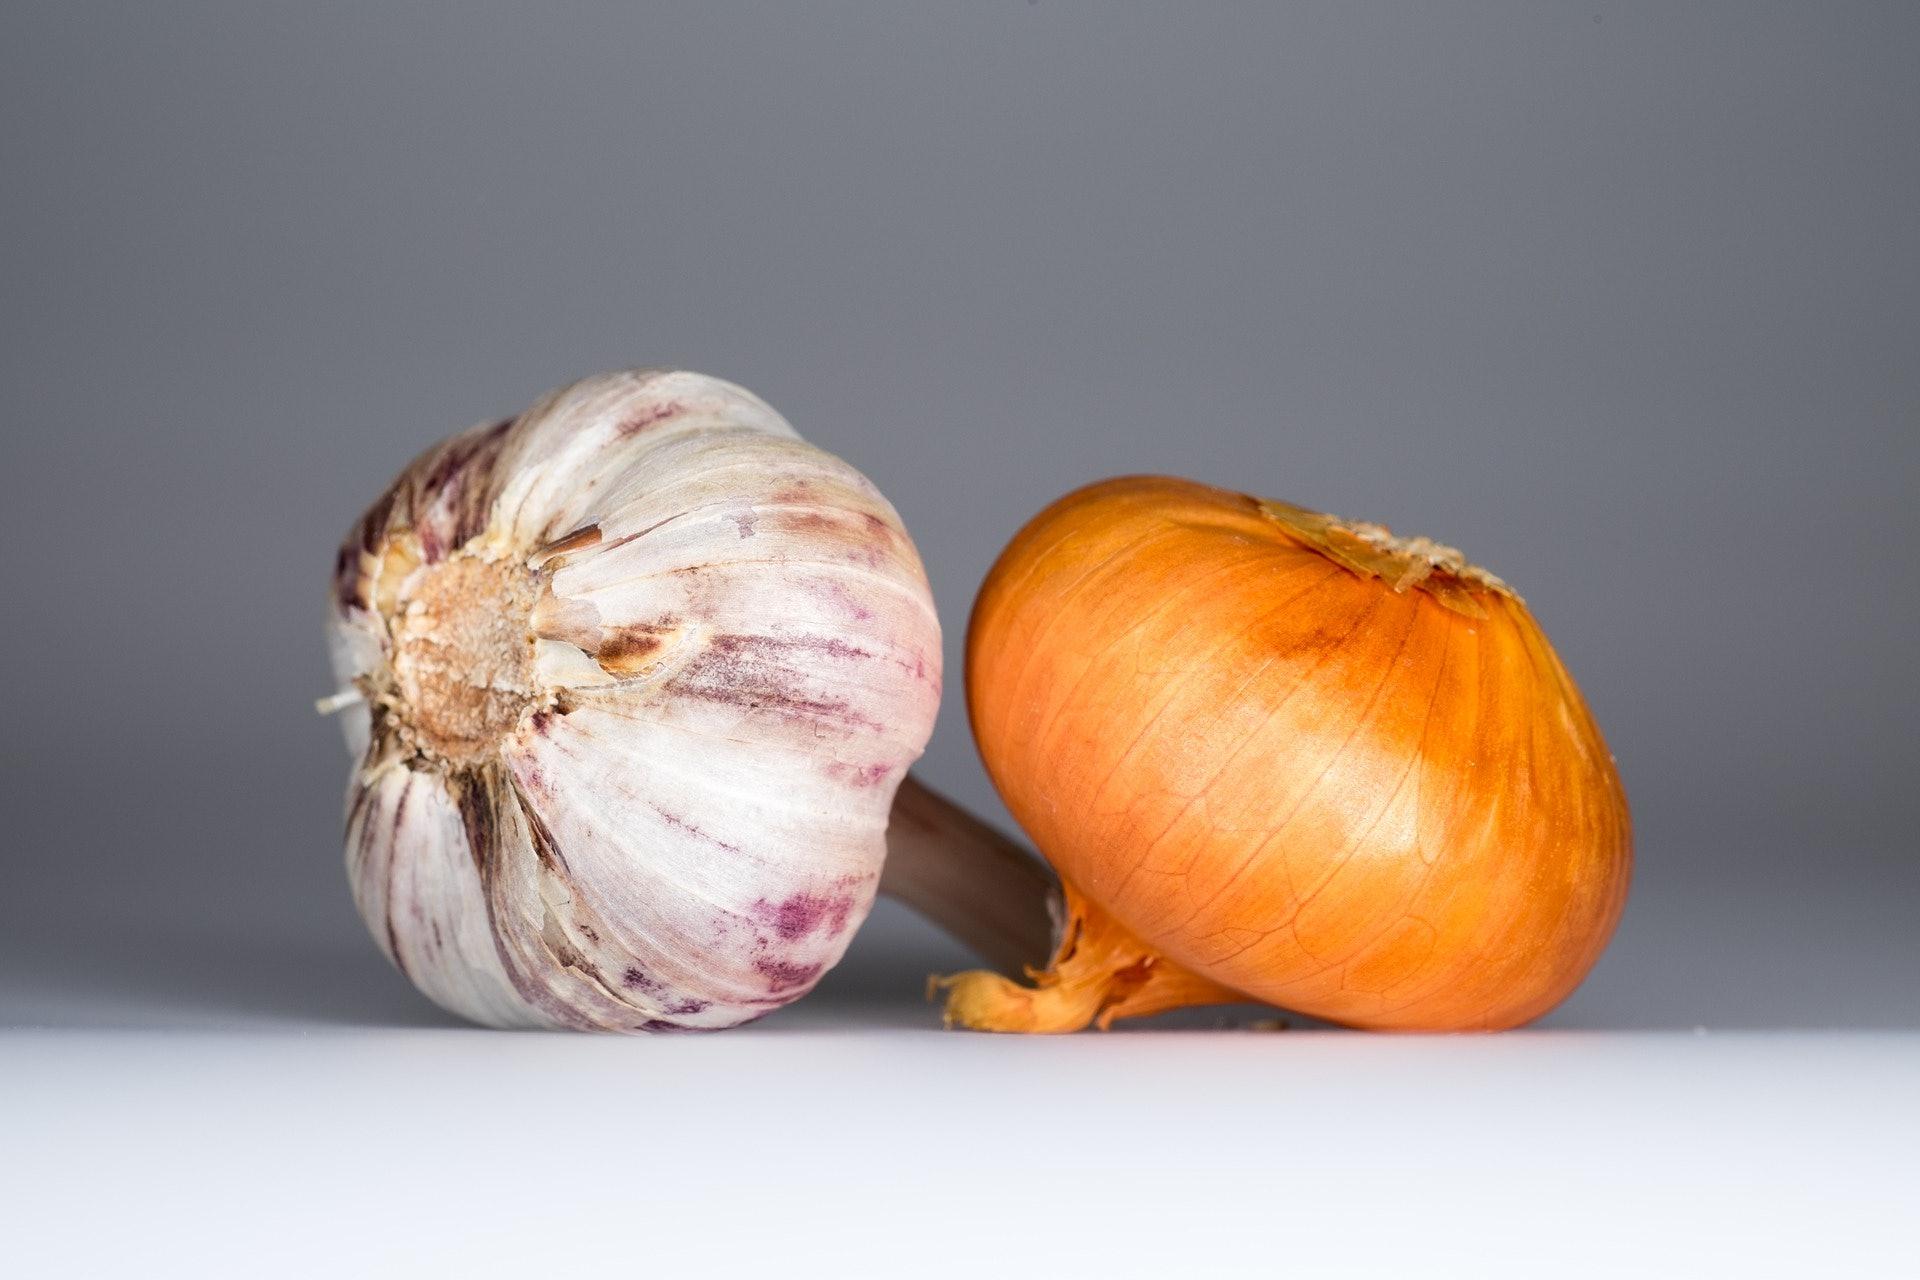 Garlic Has Major Health Benefits, Like Warding Off Acne, Grey Hair